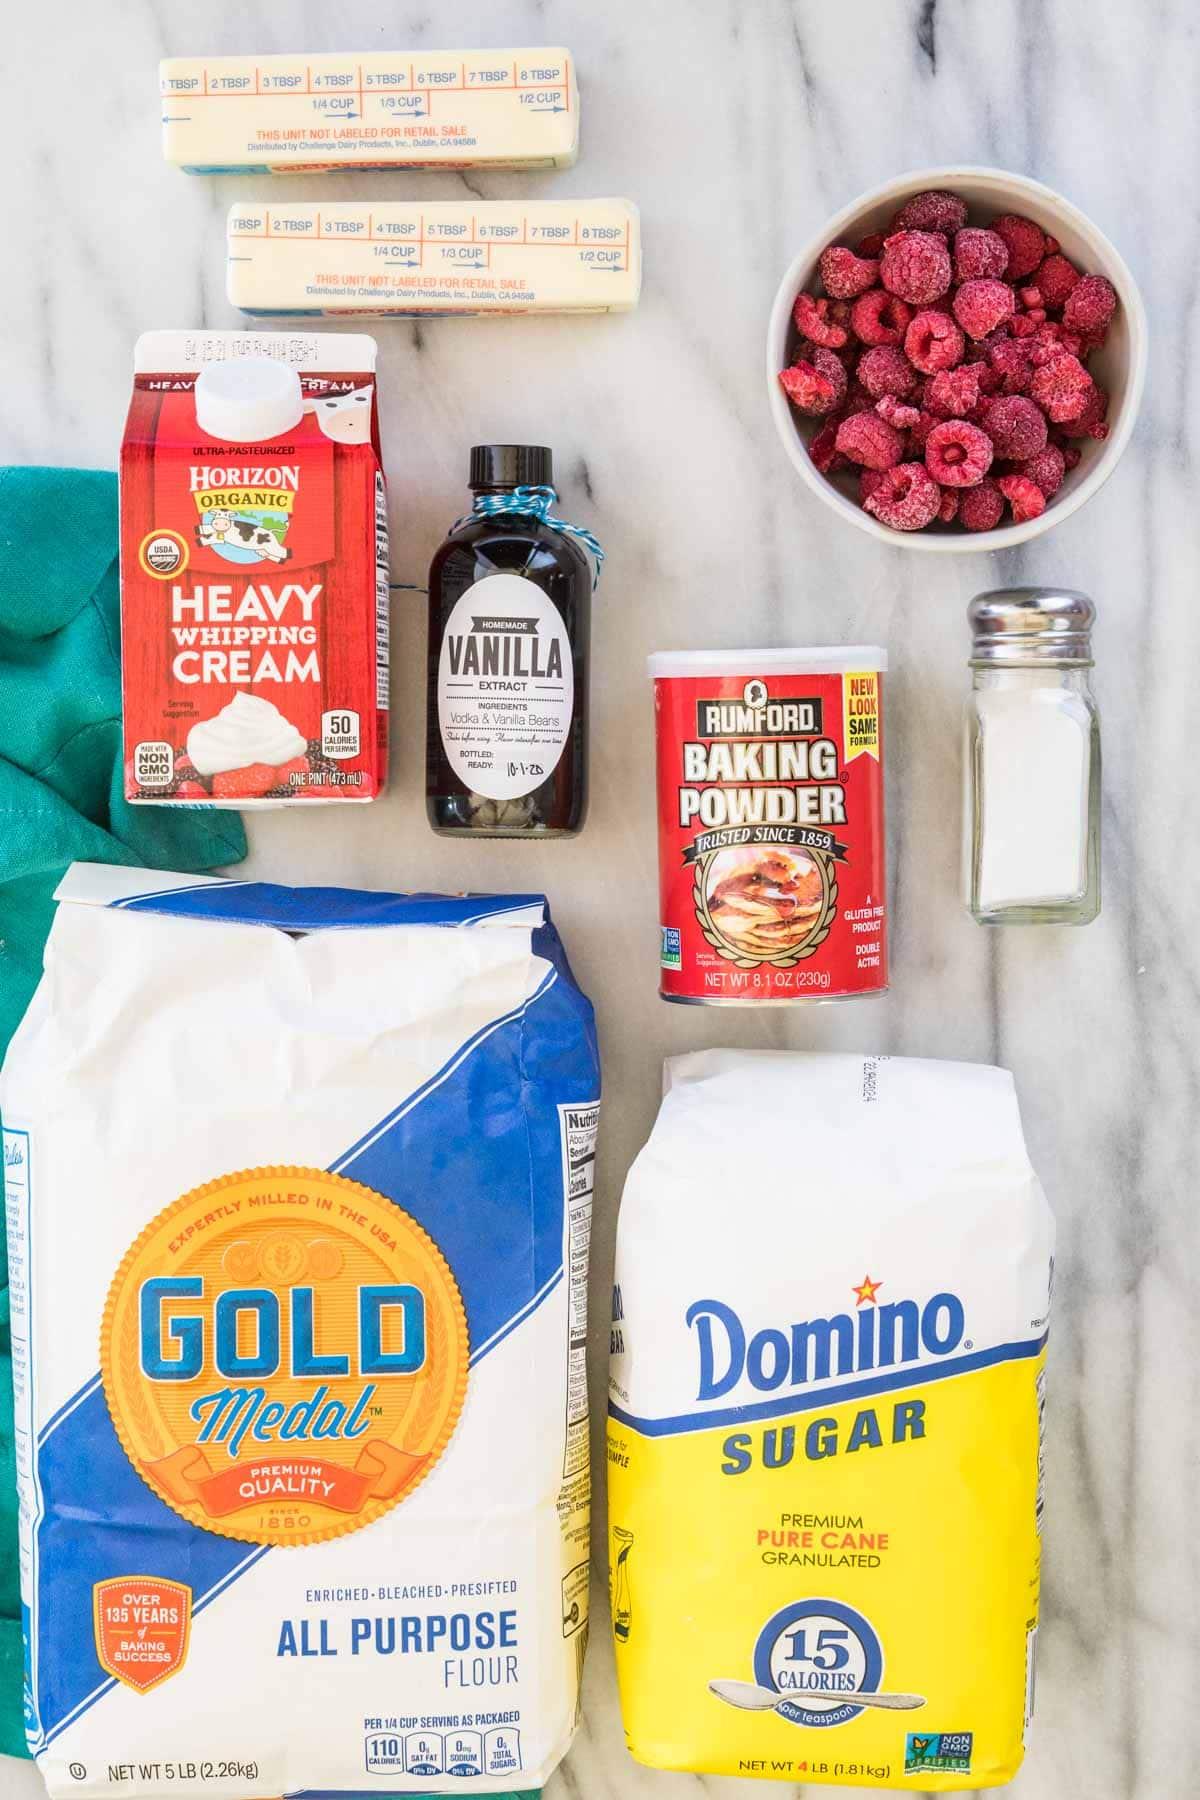 Butter, heavy whipping cream, homemade vanilla extract, baking powder, raspberries, salt, all-purpose flour, and granulated sugar